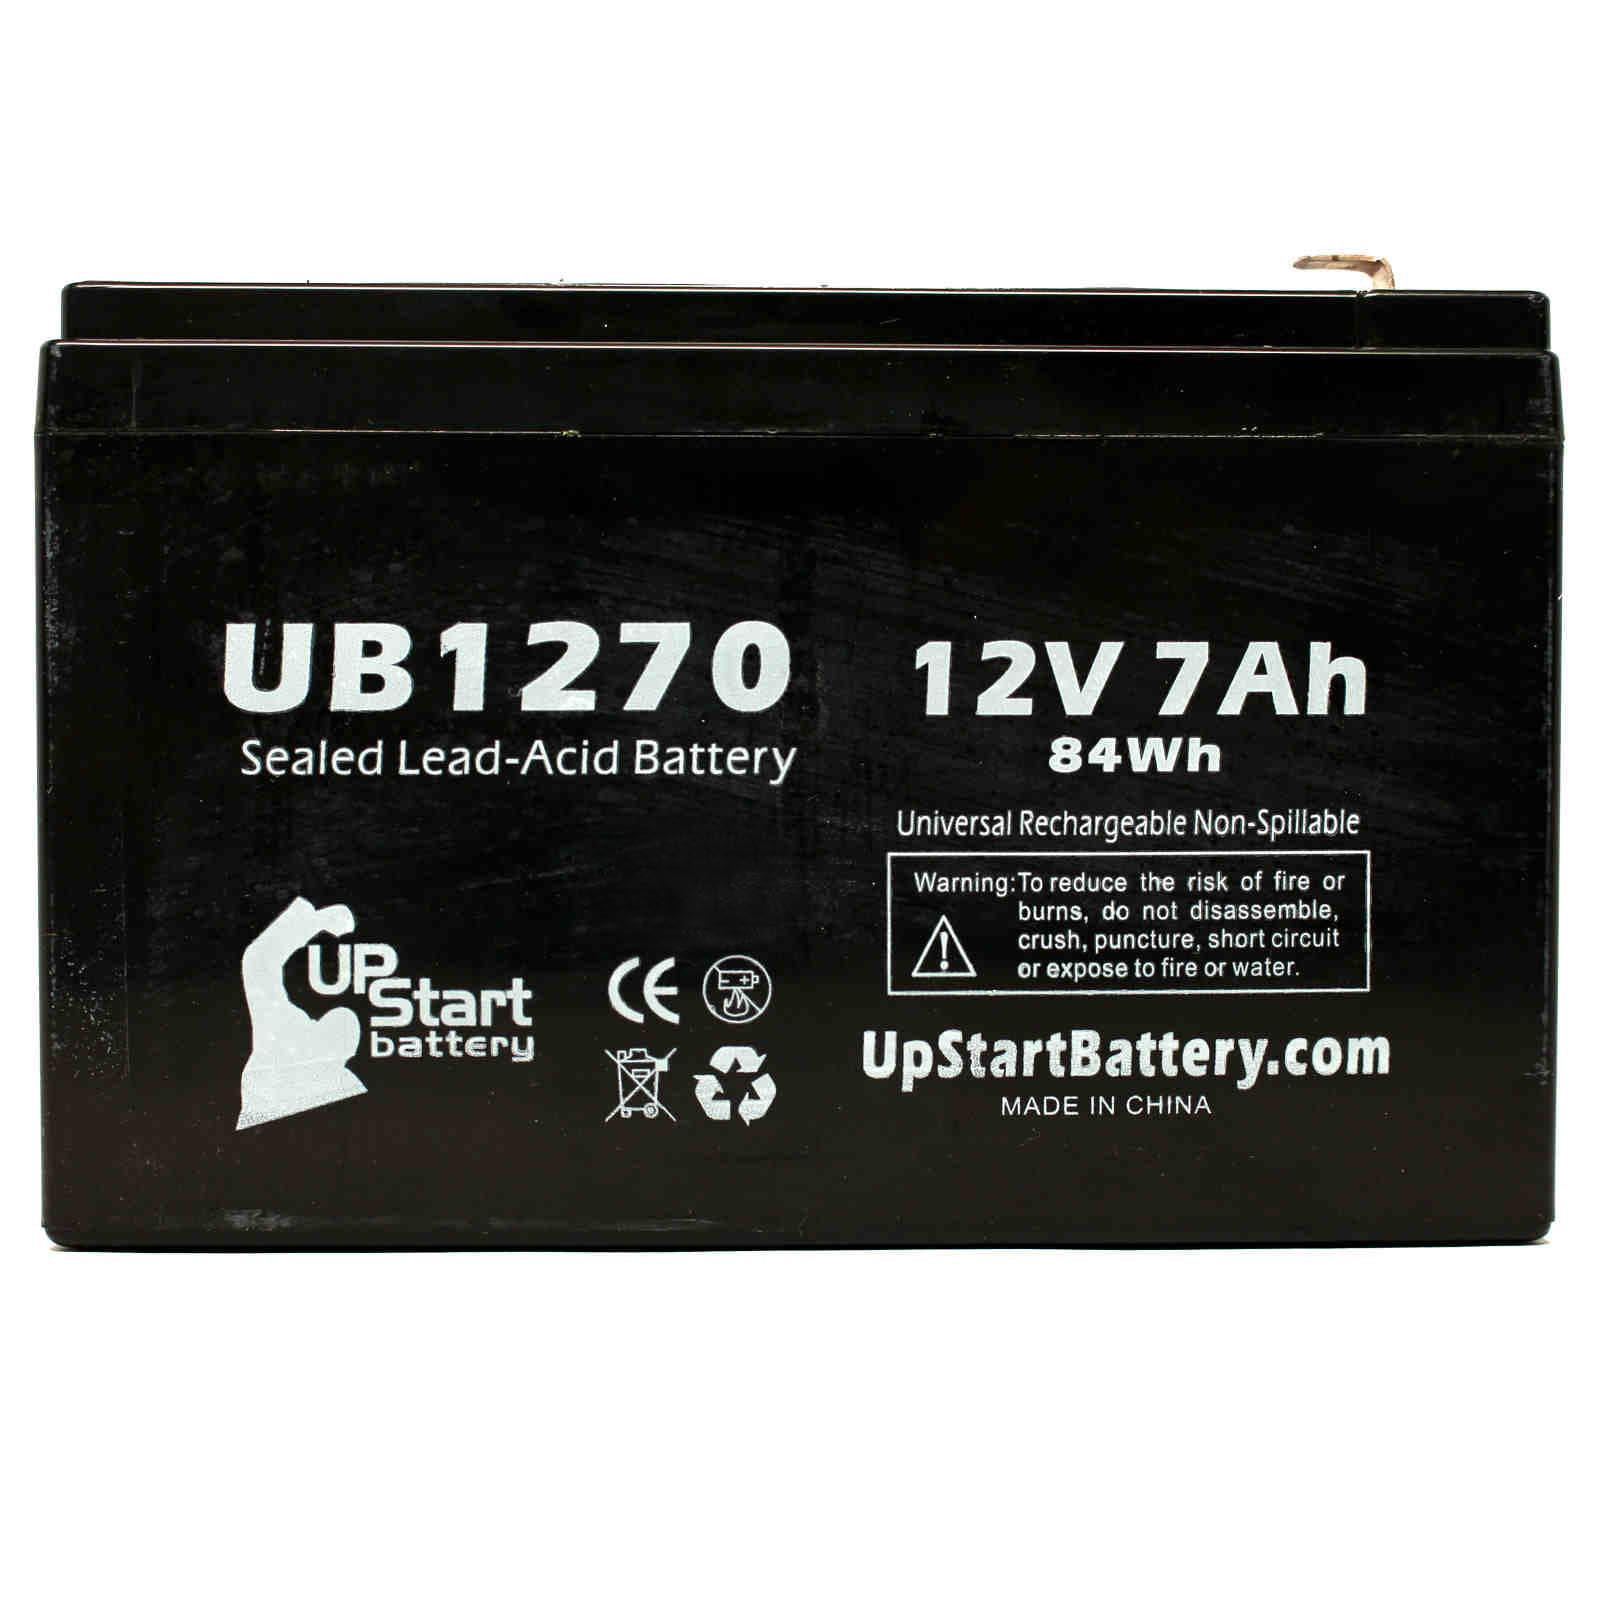 Tripp Lite AVRX750U Battery Replacement - UB1270 Universal Sealed Lead Acid Battery (12V, 7Ah, 7000mAh, F1 Terminal, AGM, SLA) - Includes TWO F1 to F2 Terminal Adapters - image 3 de 4